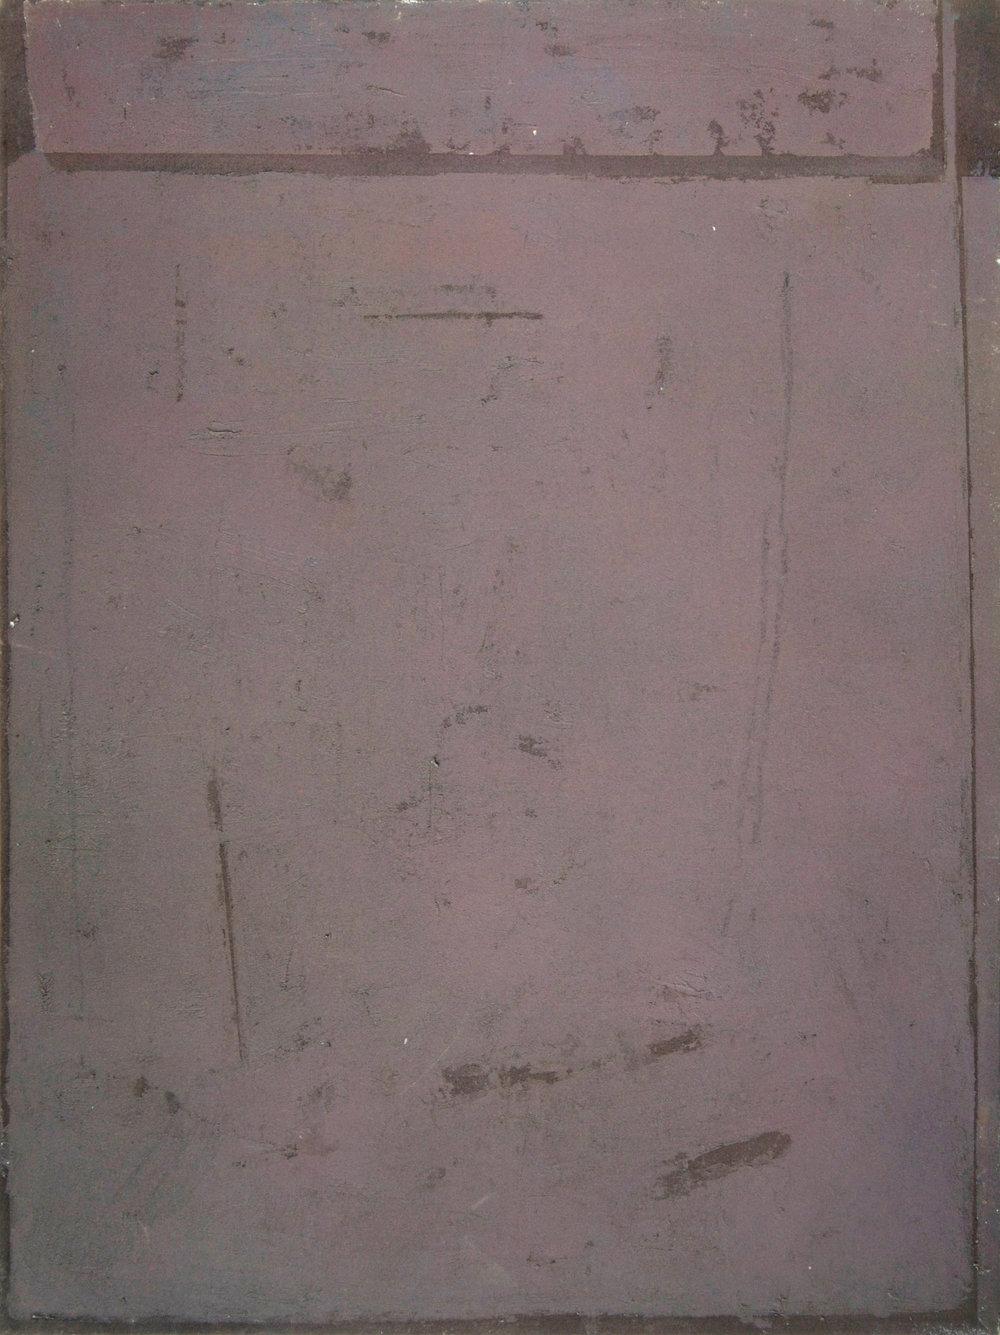 1976_UntitledNo7602_acryliconcanvas_53x40_PNF075.jpg